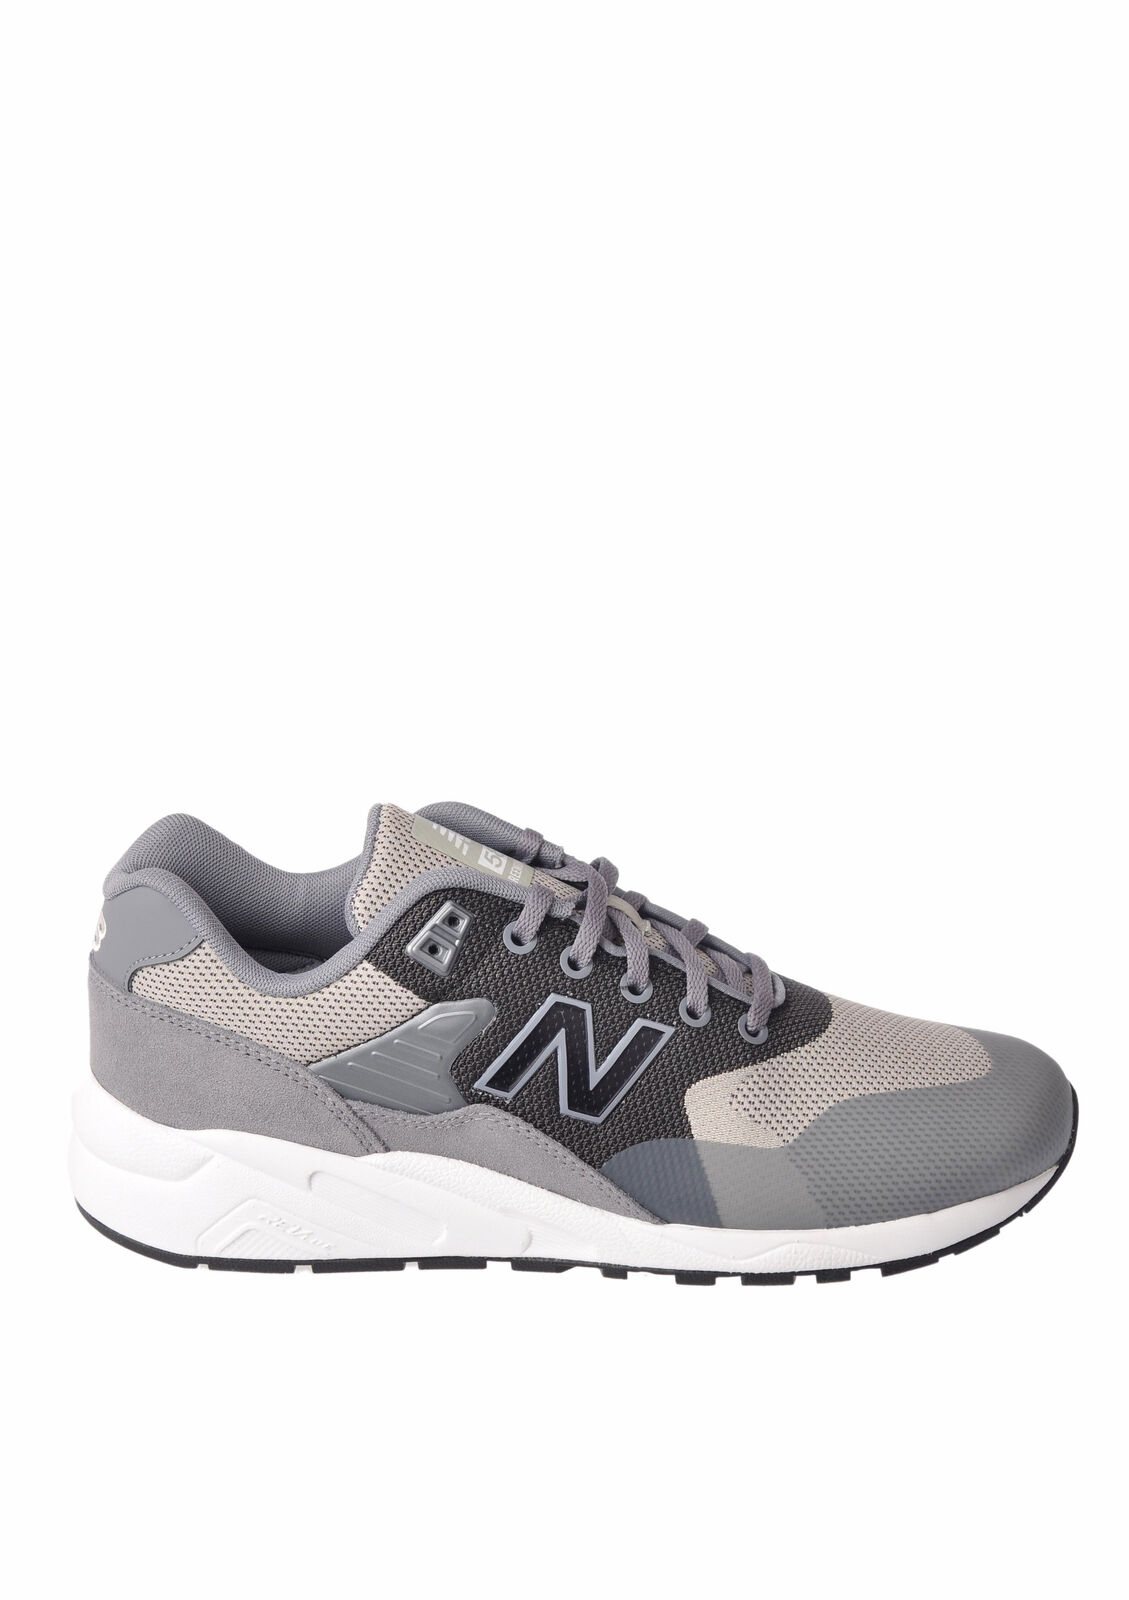 nuovo Balance  -  Lace up sautope - Male - grigio - 2578527N173904